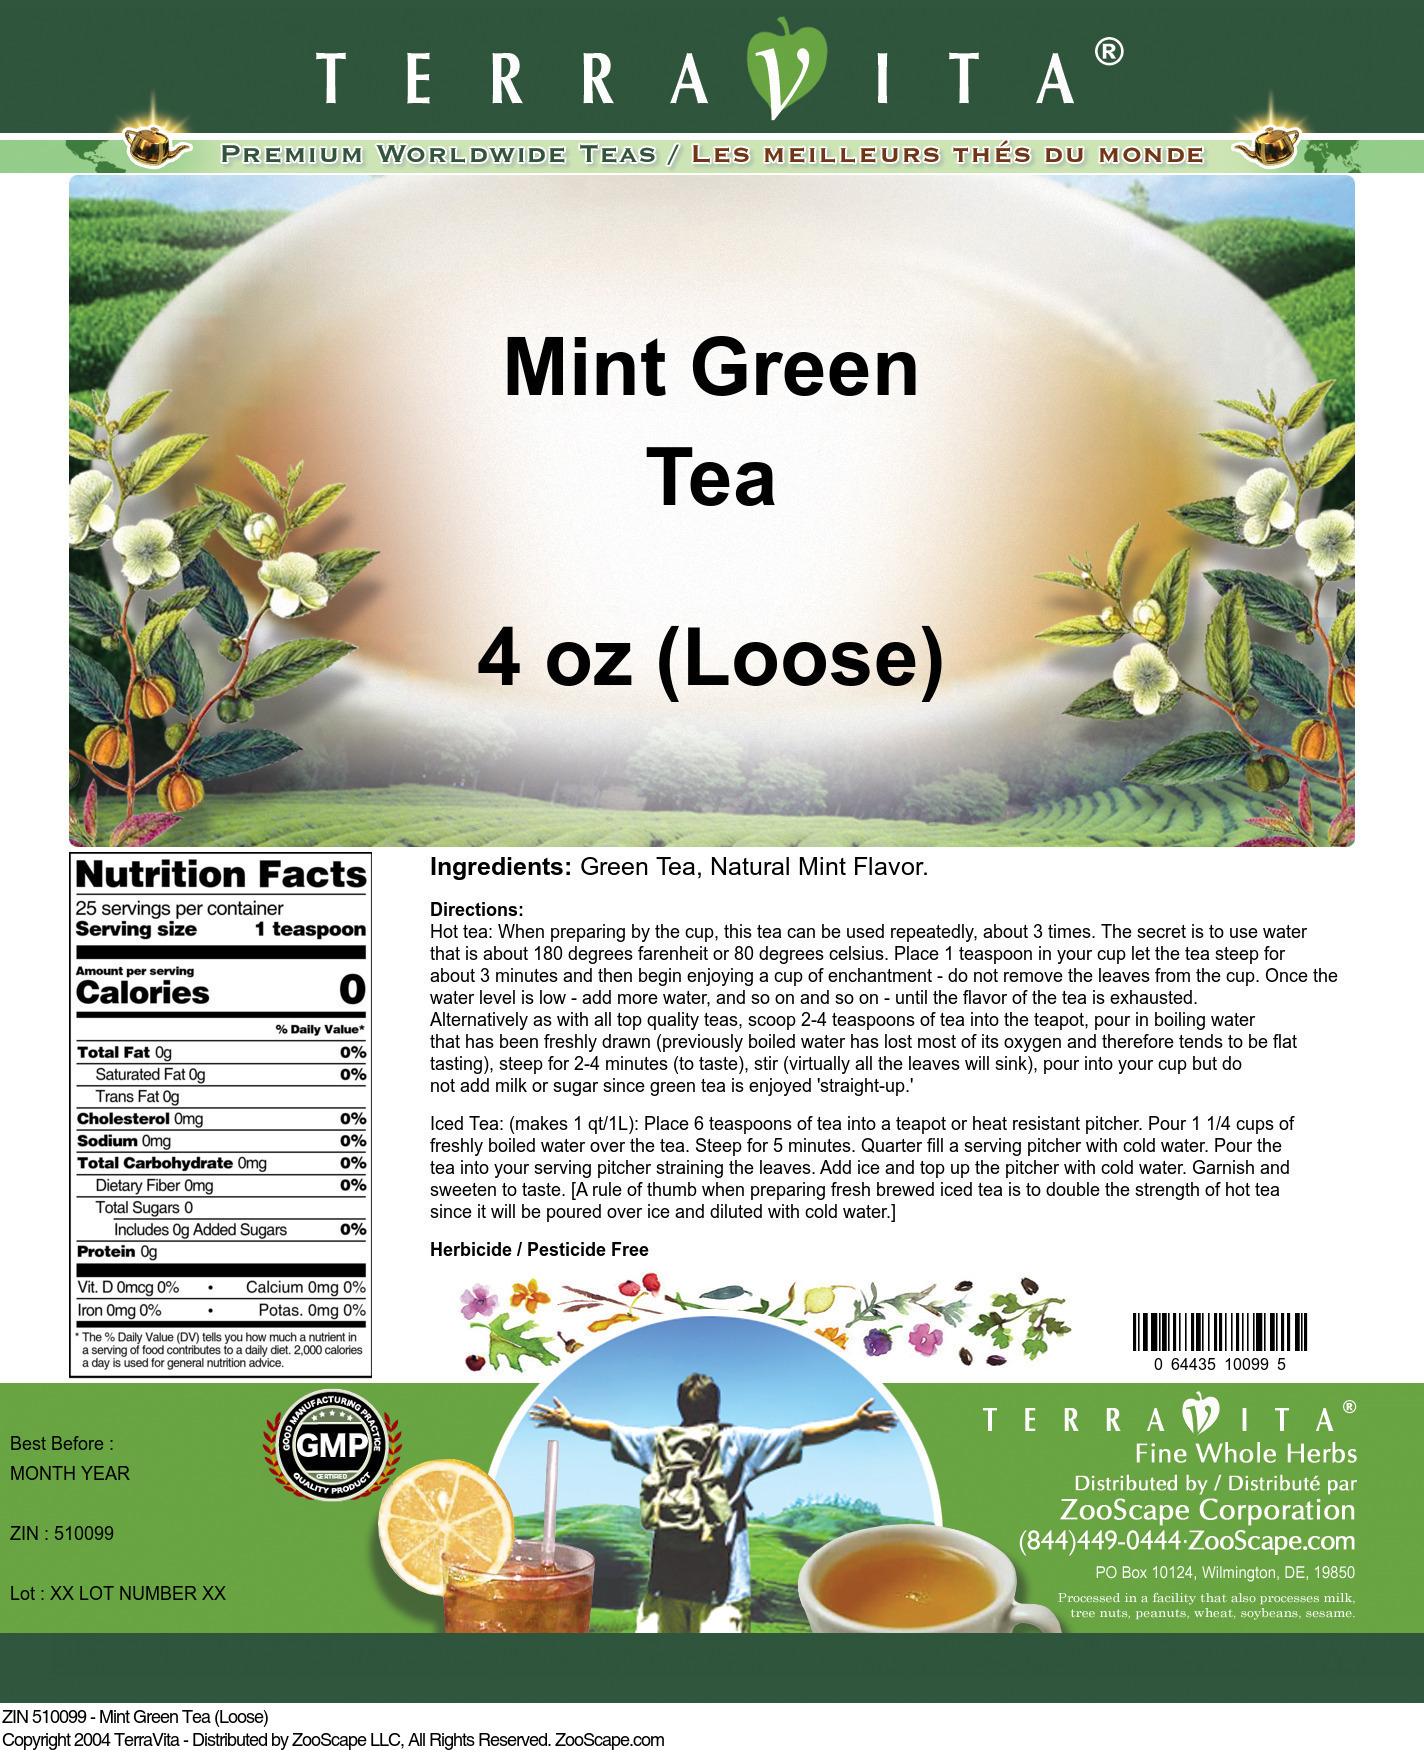 Mint Green Tea